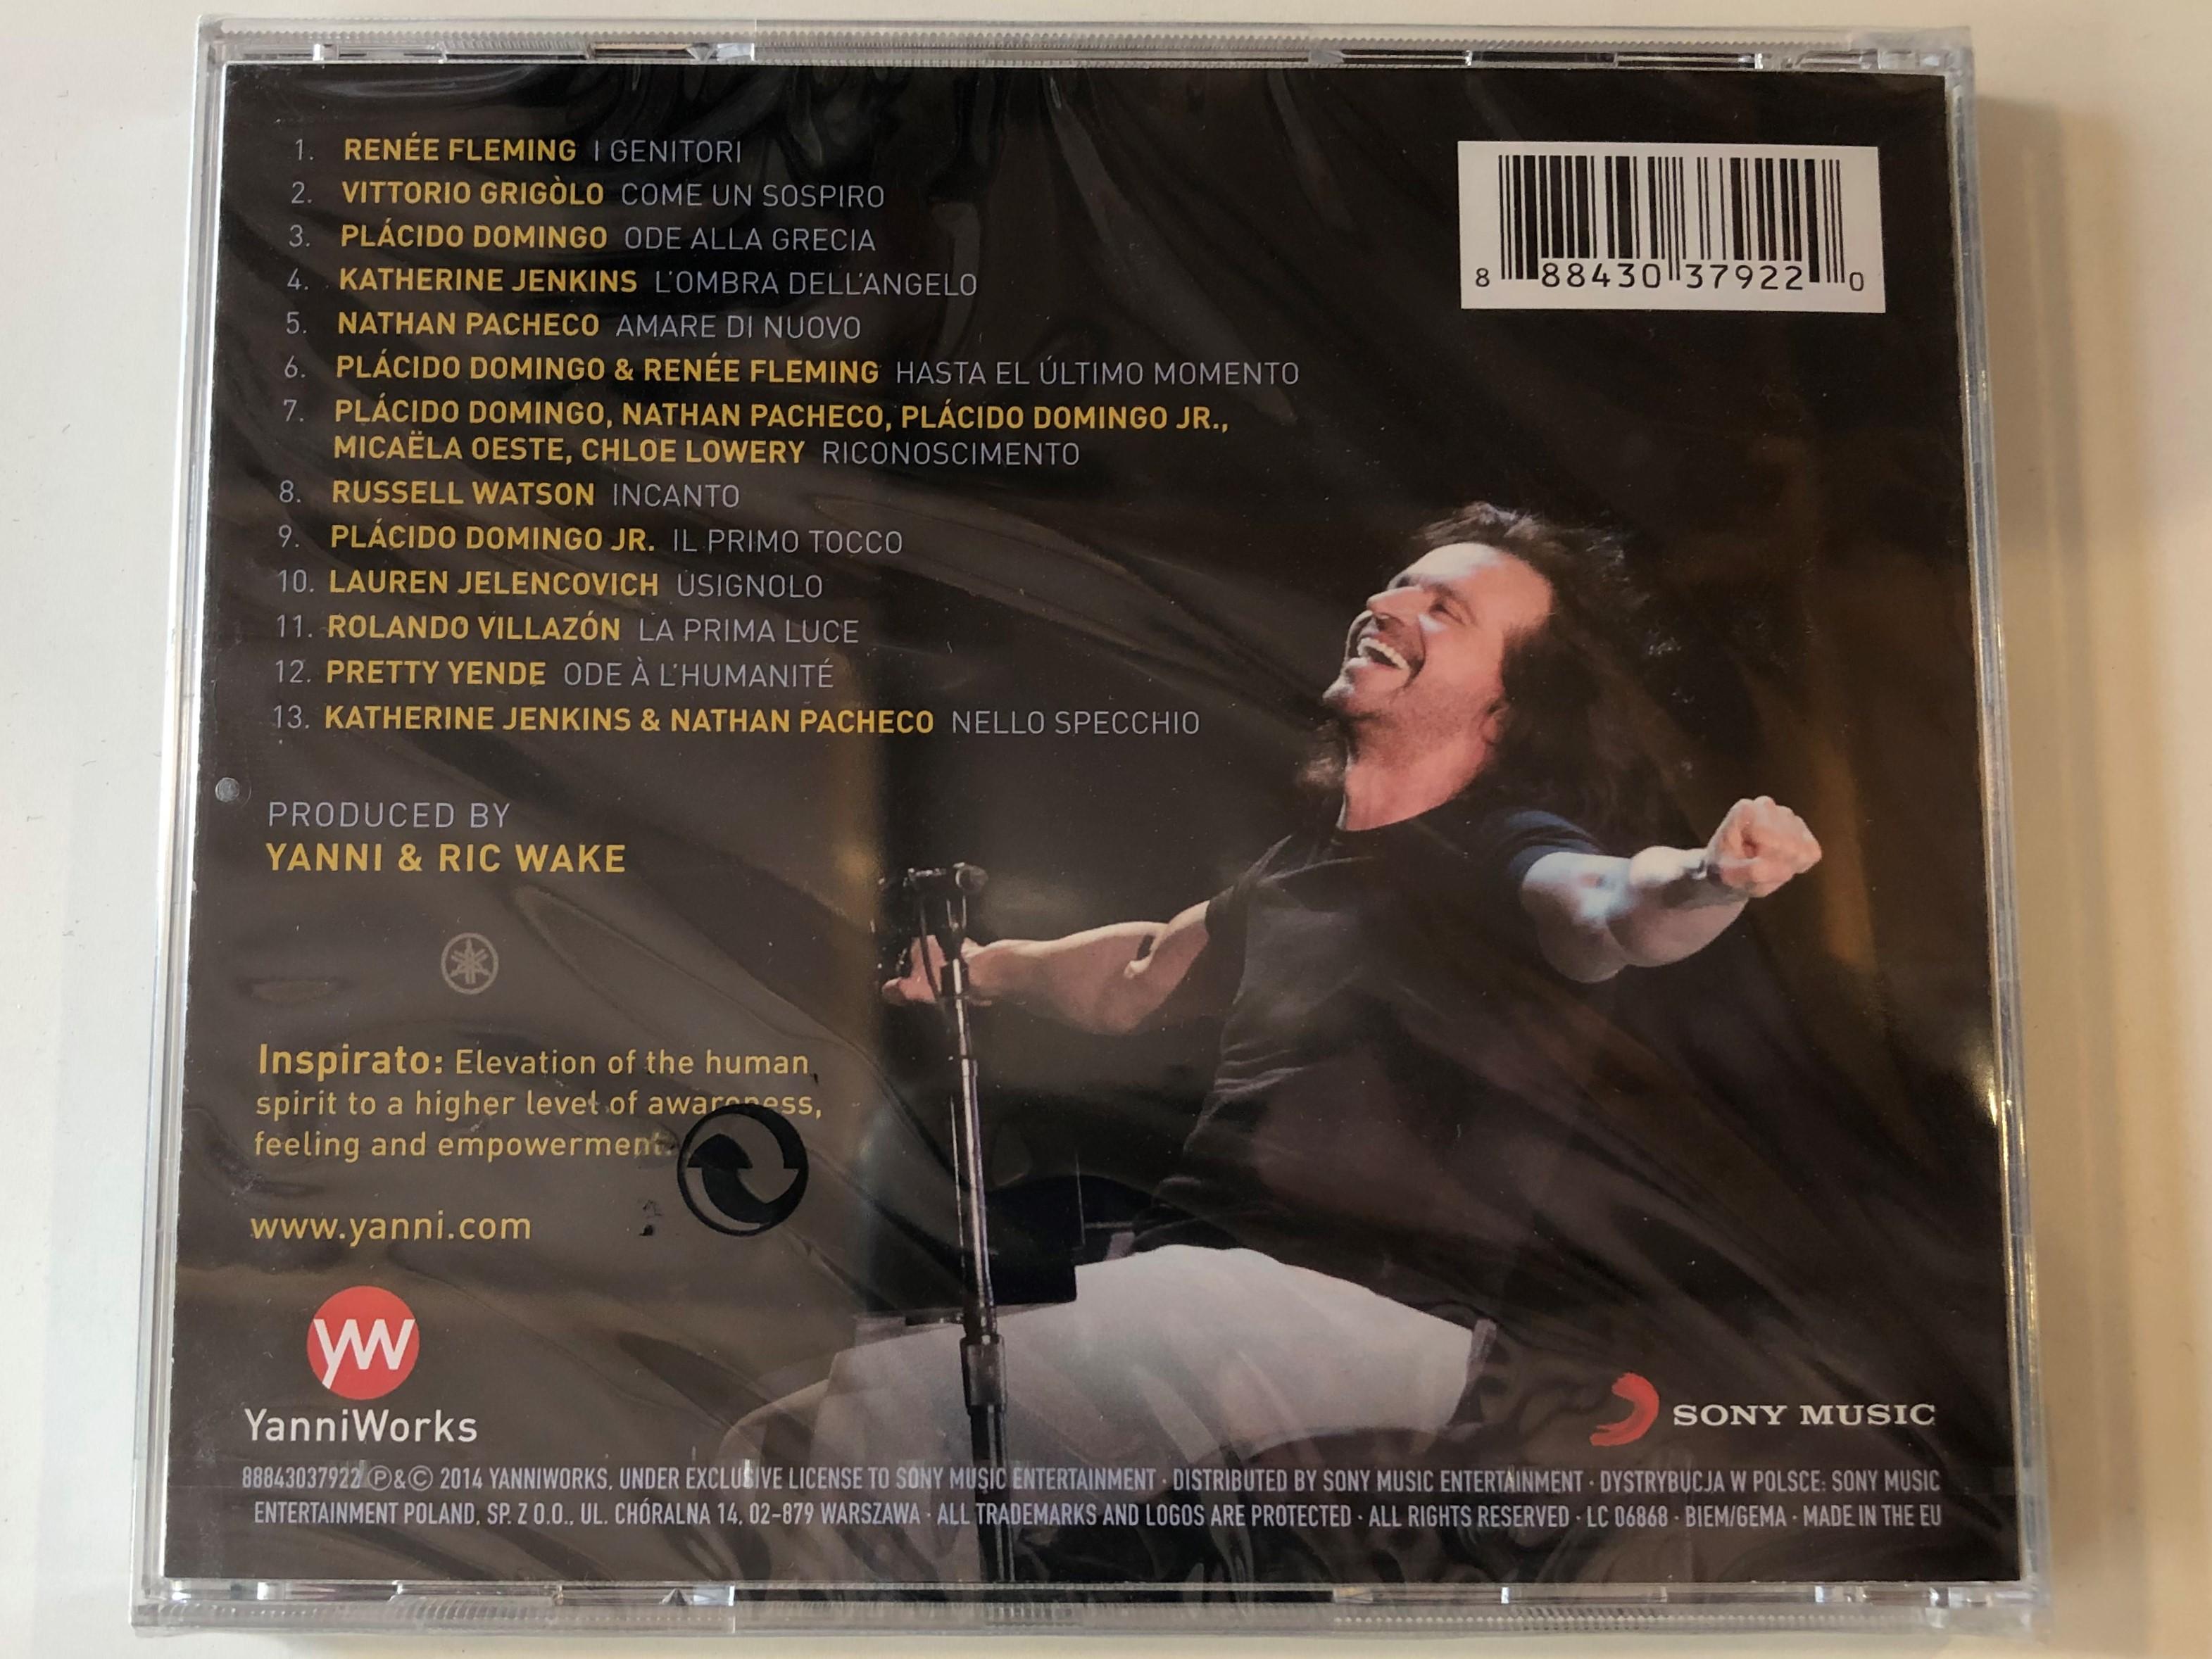 yanni-inspirato-yanni-s-greatest-music-performed-by-the-world-s-most-extraordinary-voices-featuring-placido-domingo-ren-e-fleming-rolando-villaz-n-katherine-jenkins-vittorio-grigolo-...-.jpg